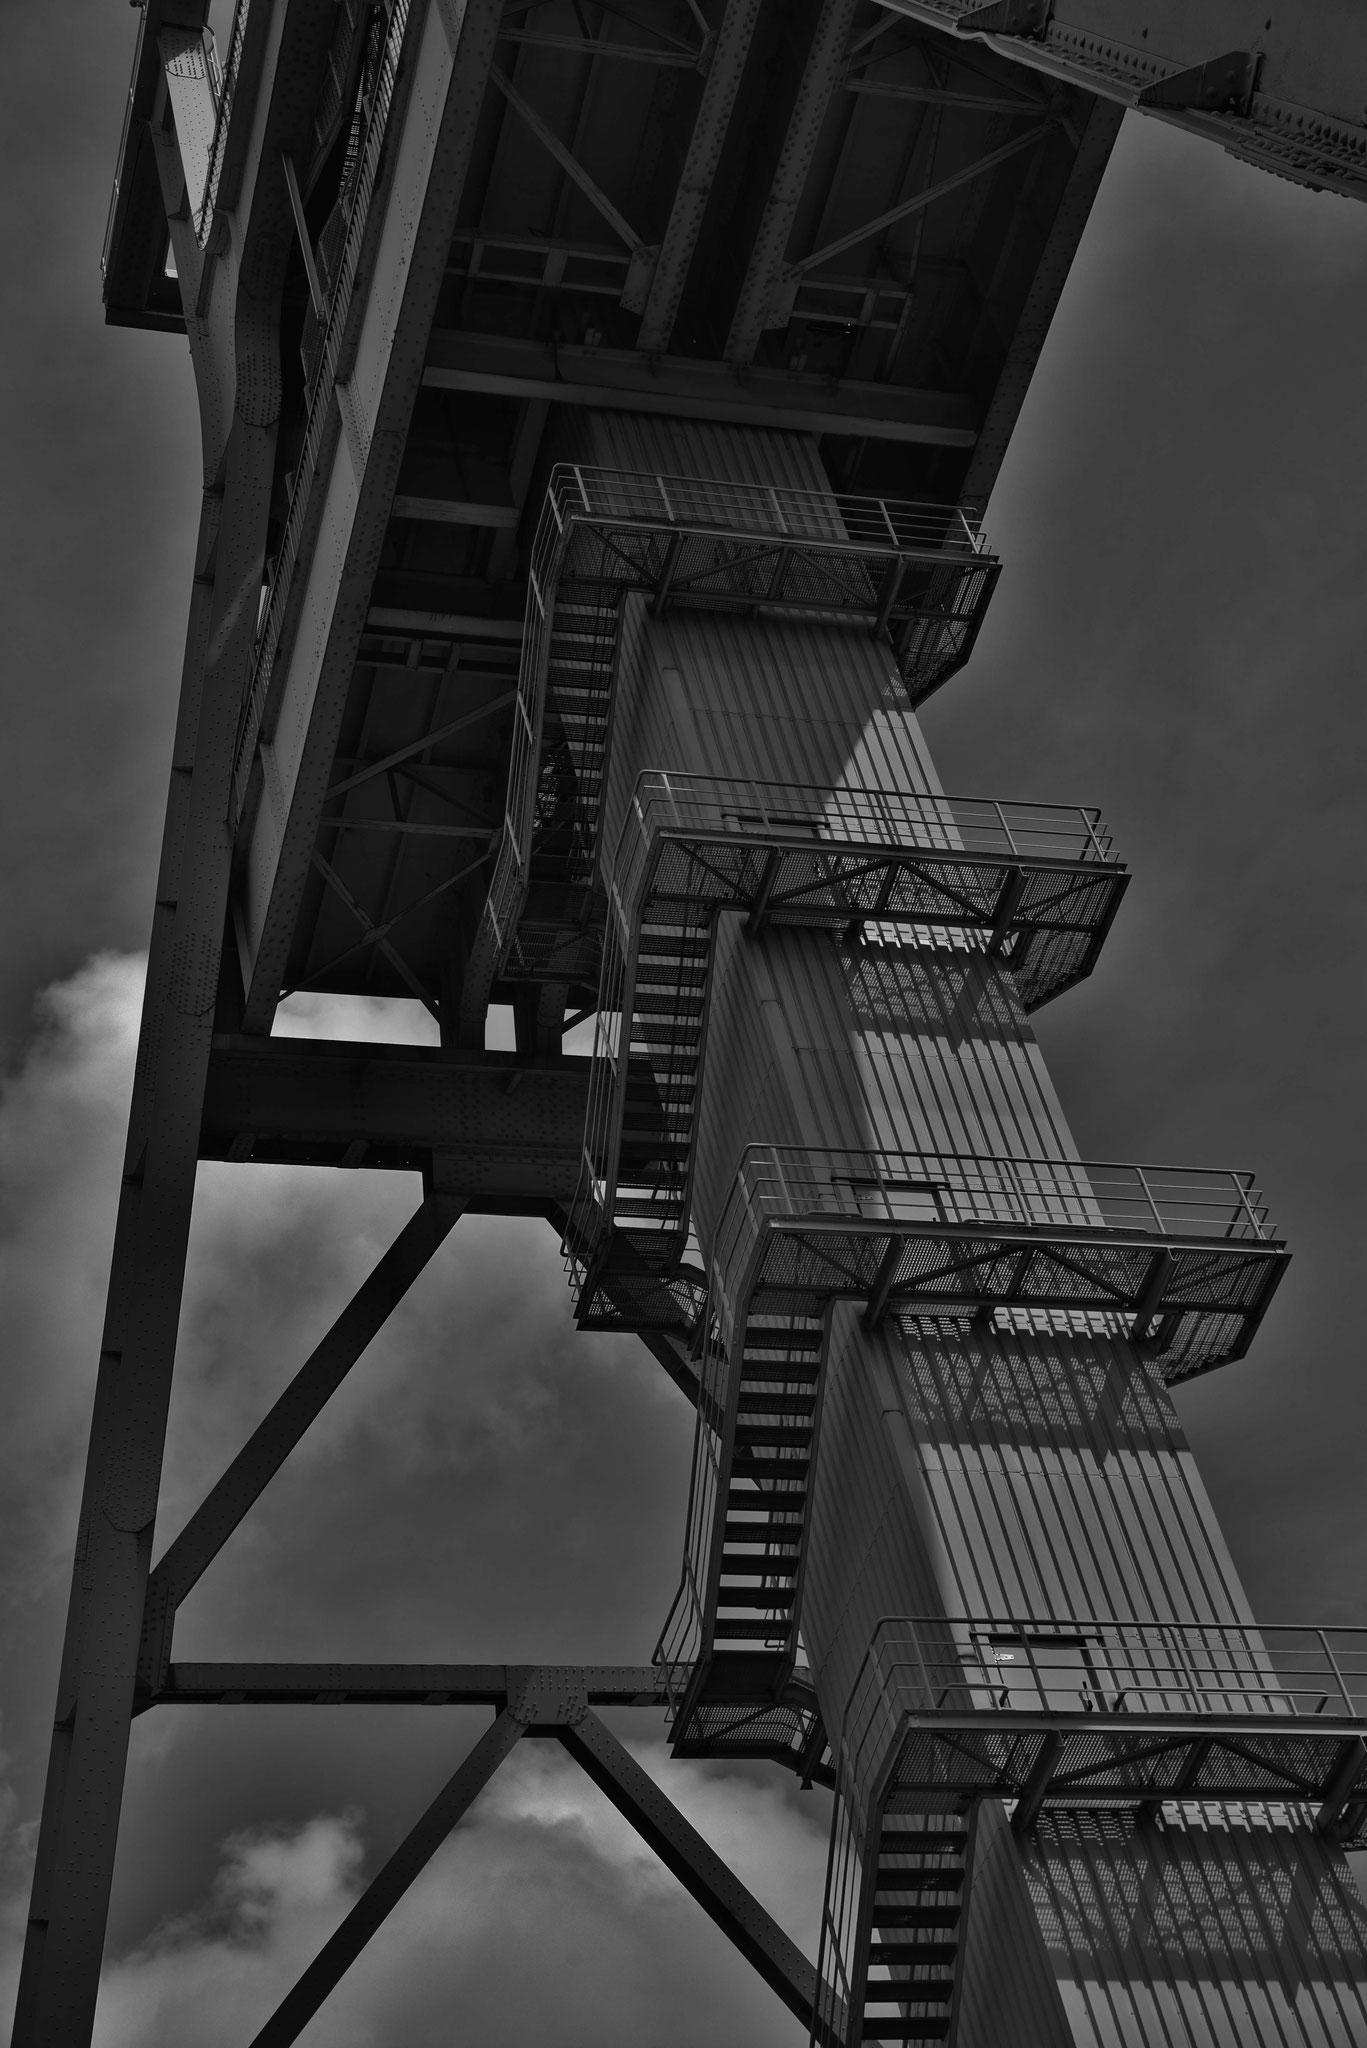 Aufgang des Förderturms (in SW gewandelt)